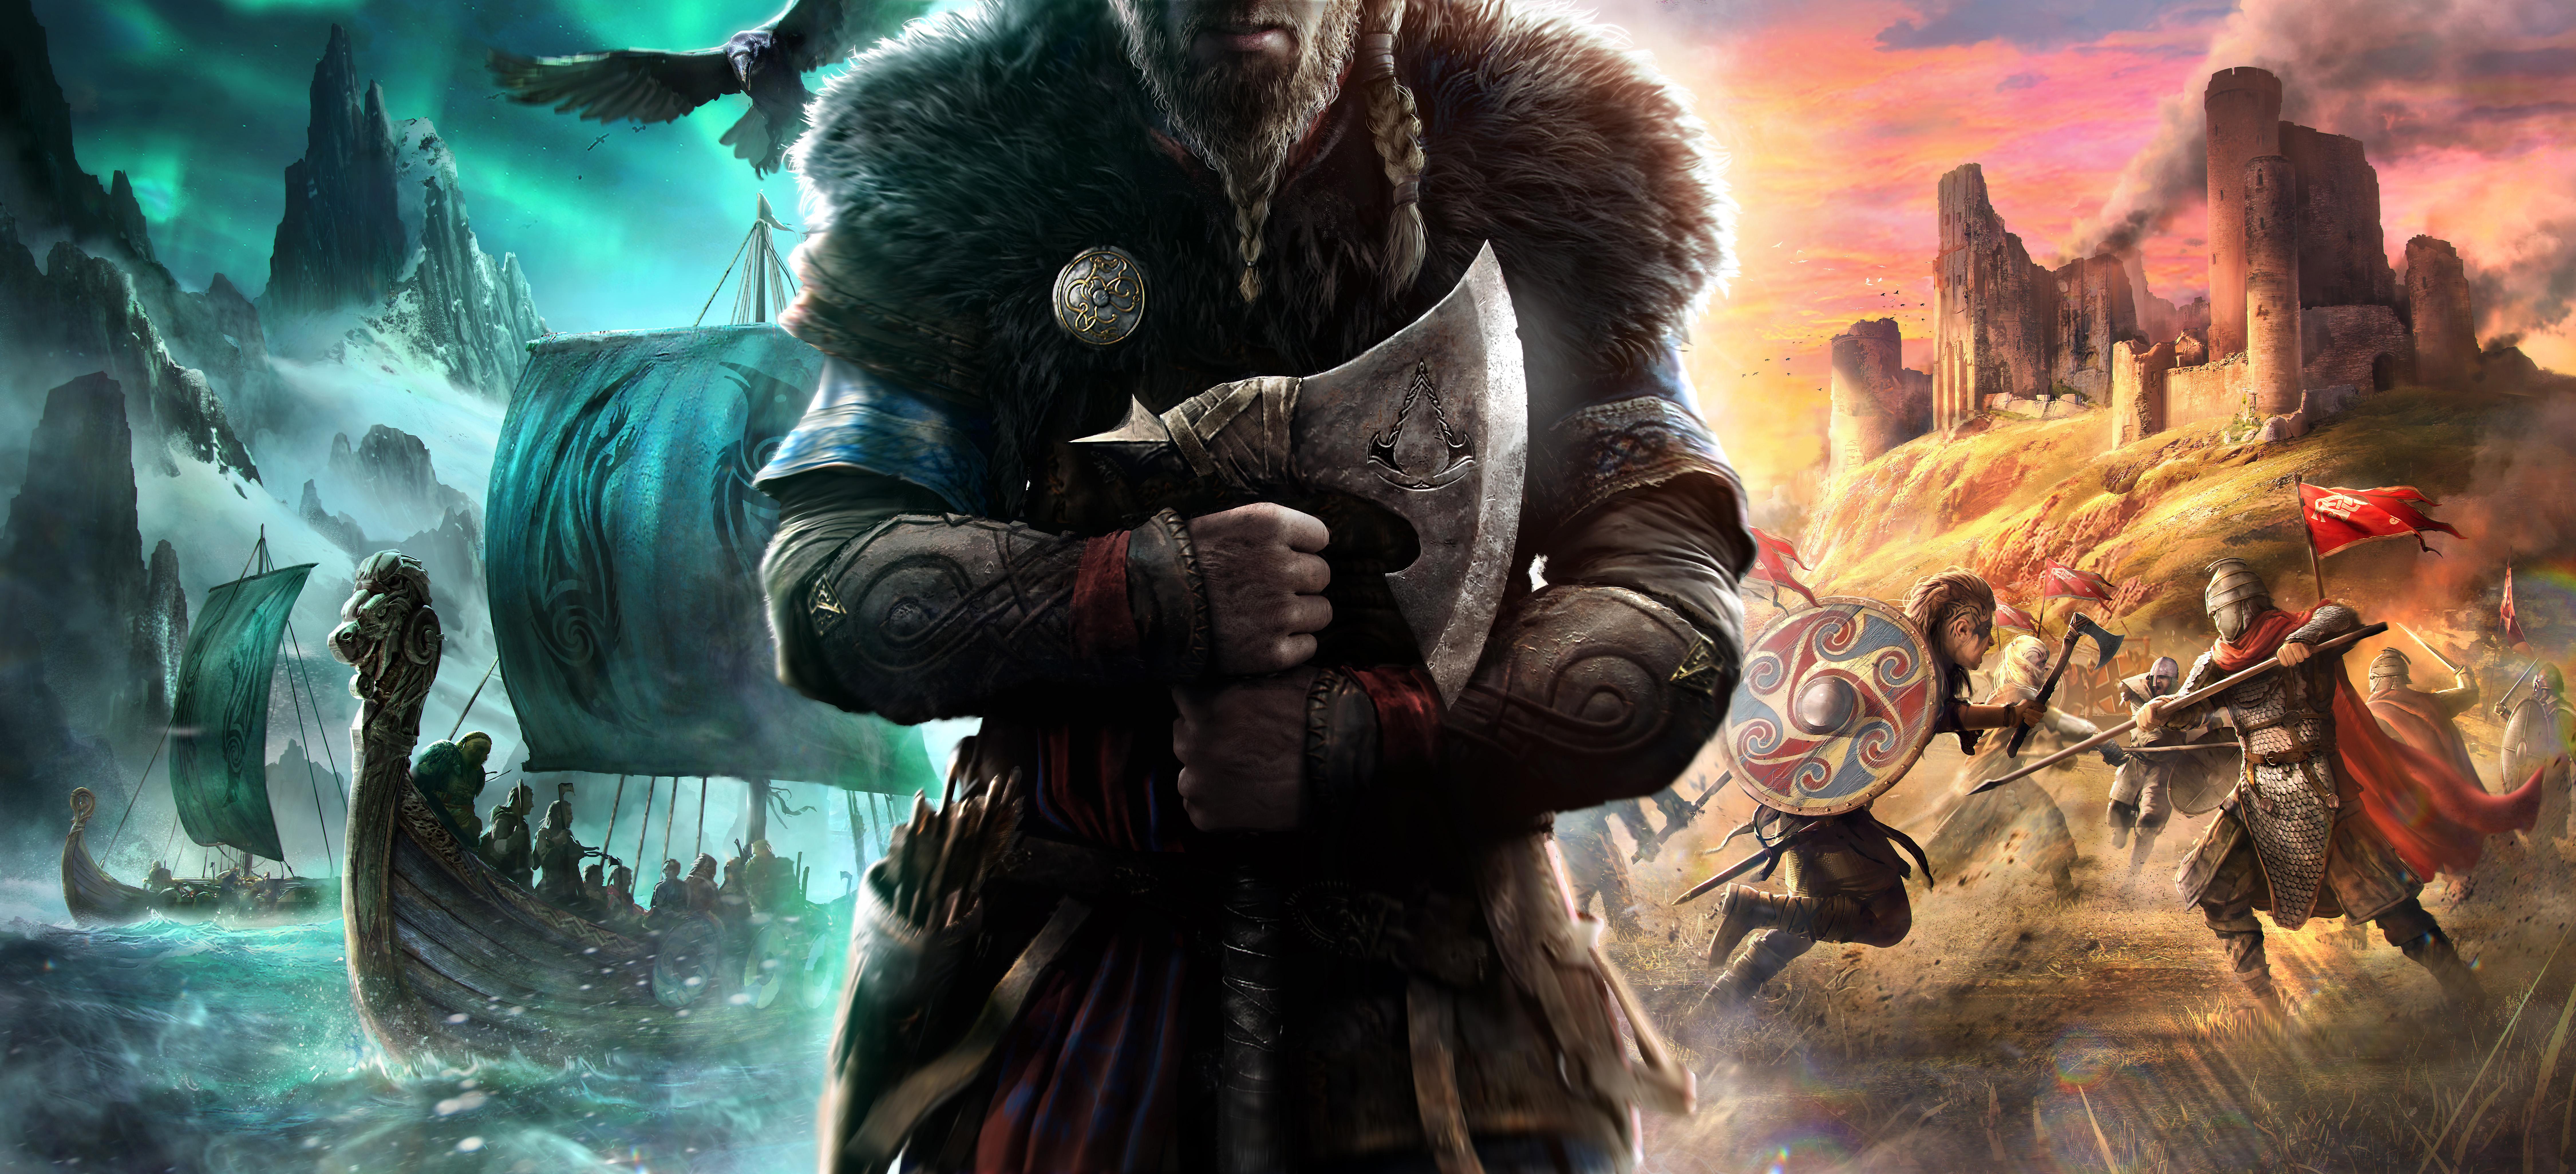 General 9000x4102 Assassin's Creed: Valhalla video games game art digital art viking Axe boat shield sword armor raven ultrawide ultra-wide